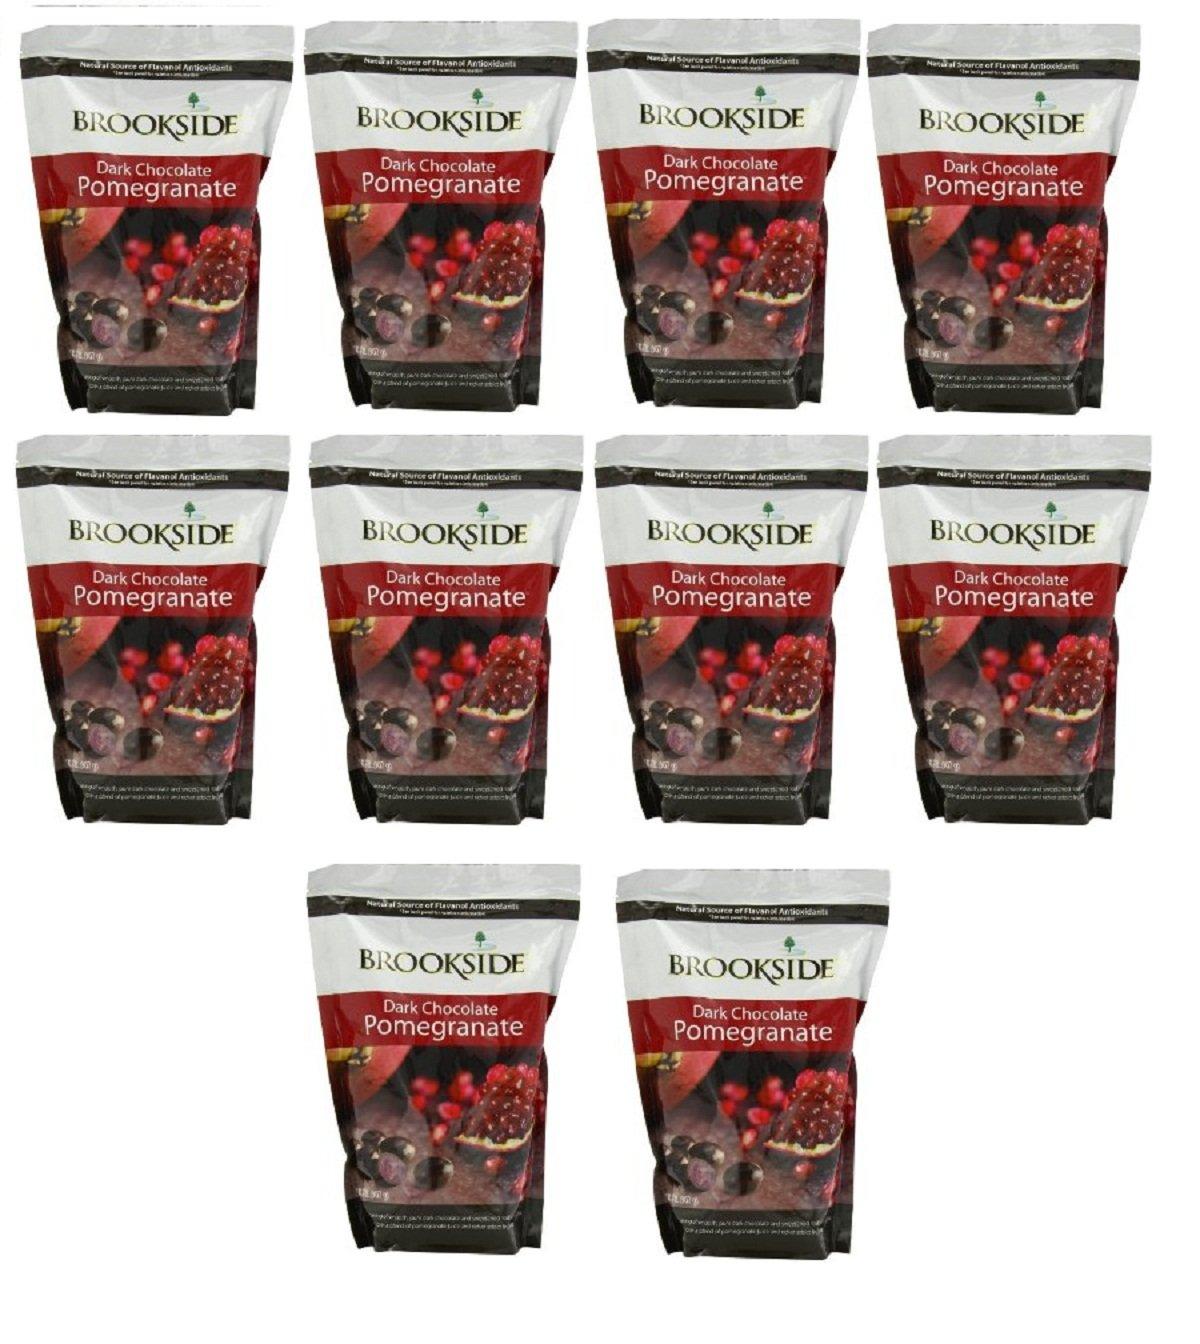 Amazon.com : Brookside Dark Chocolate Pomegranate and Fruit ...